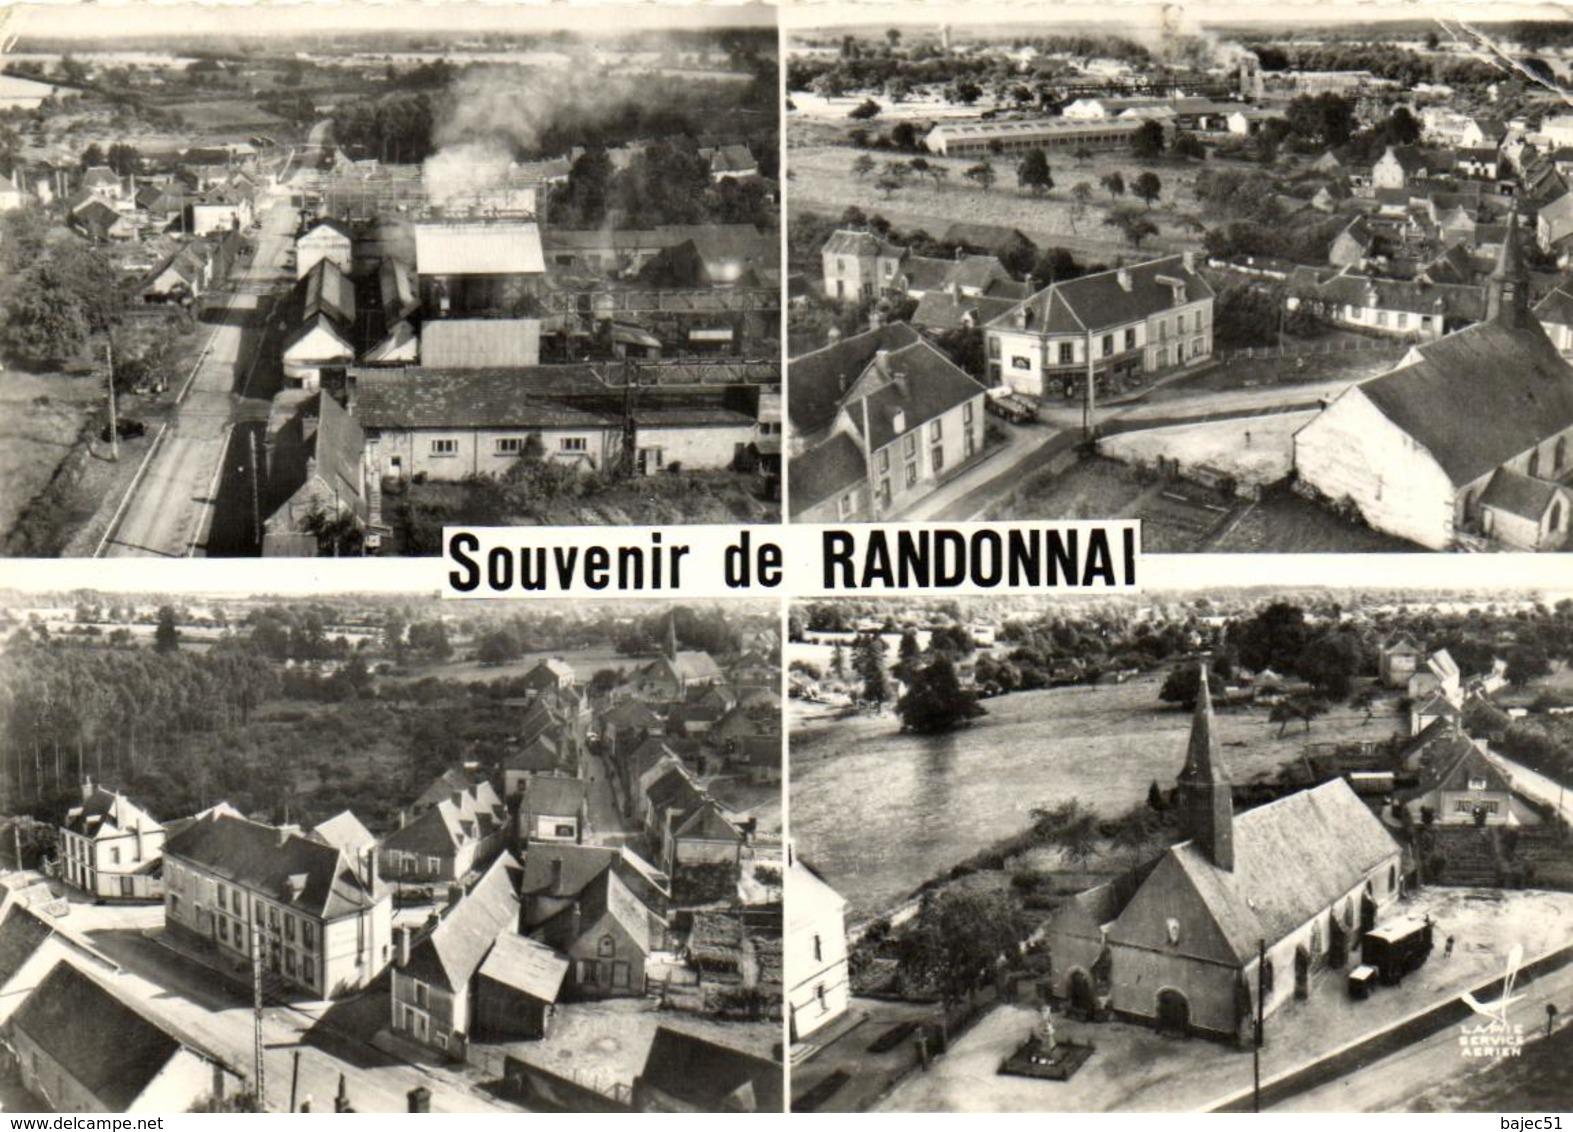 1 Cpsm Souvenir De Randonnai - France